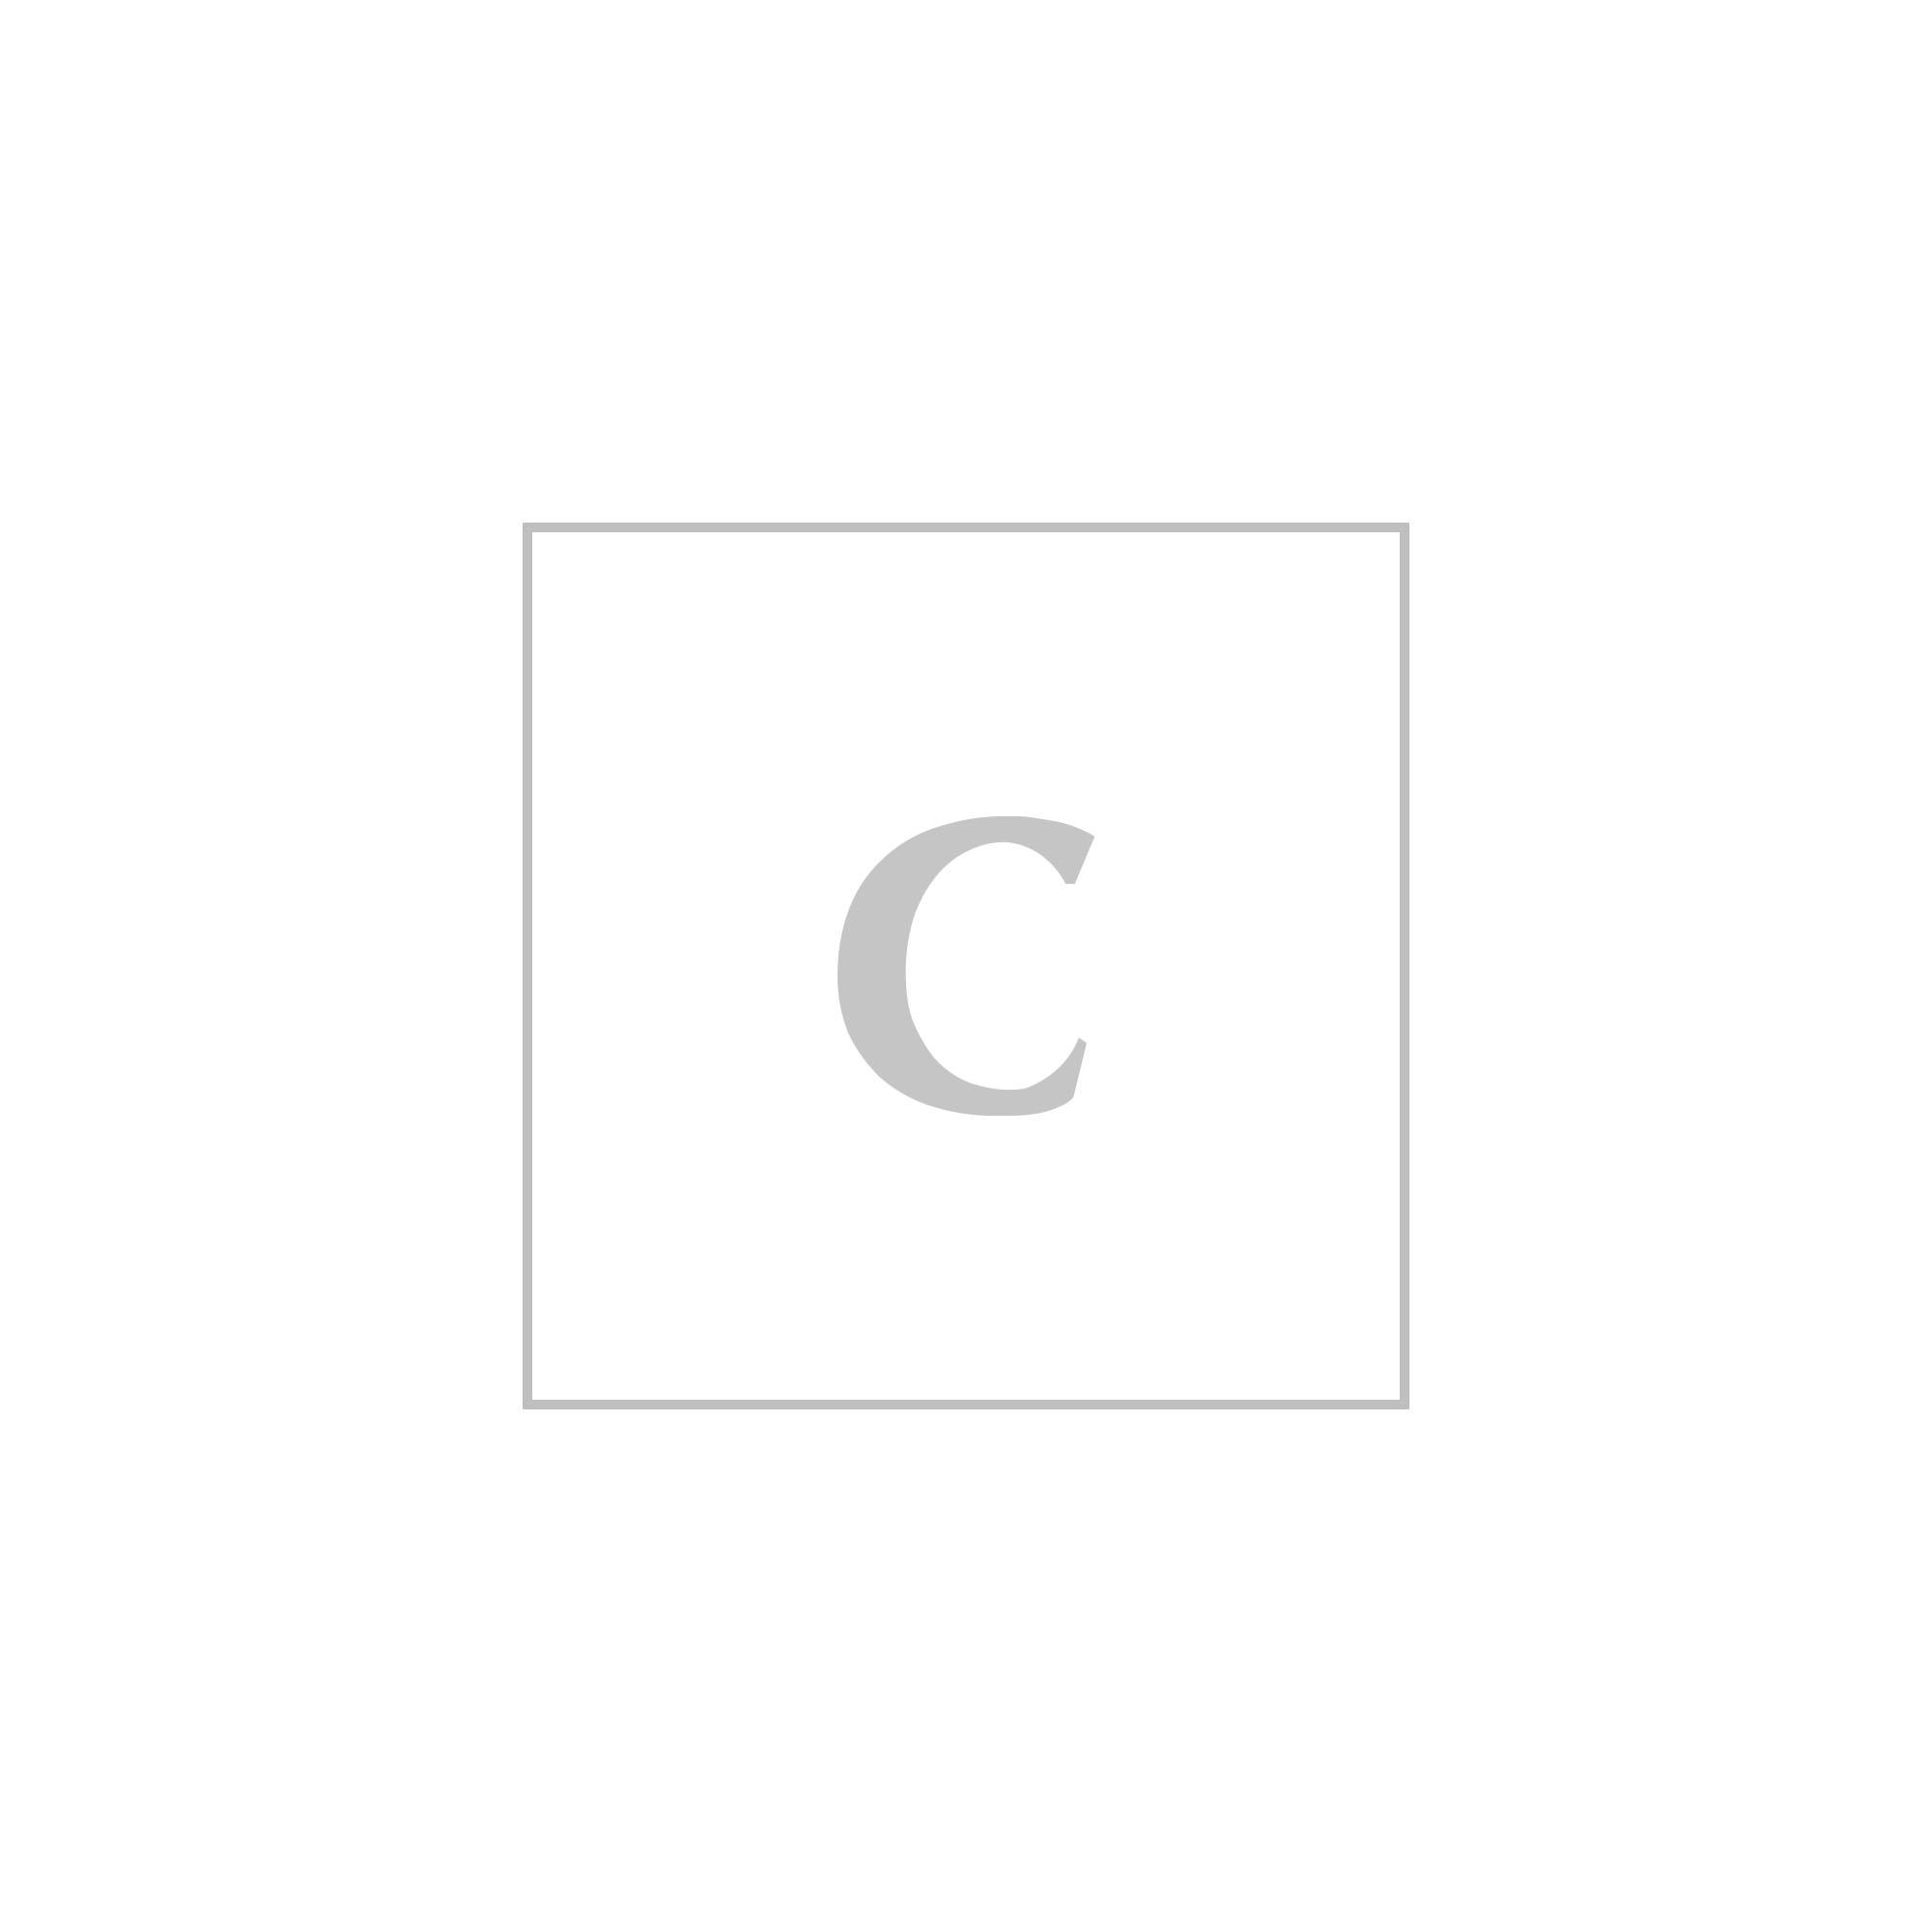 Prada top cloquet astratto garza lino